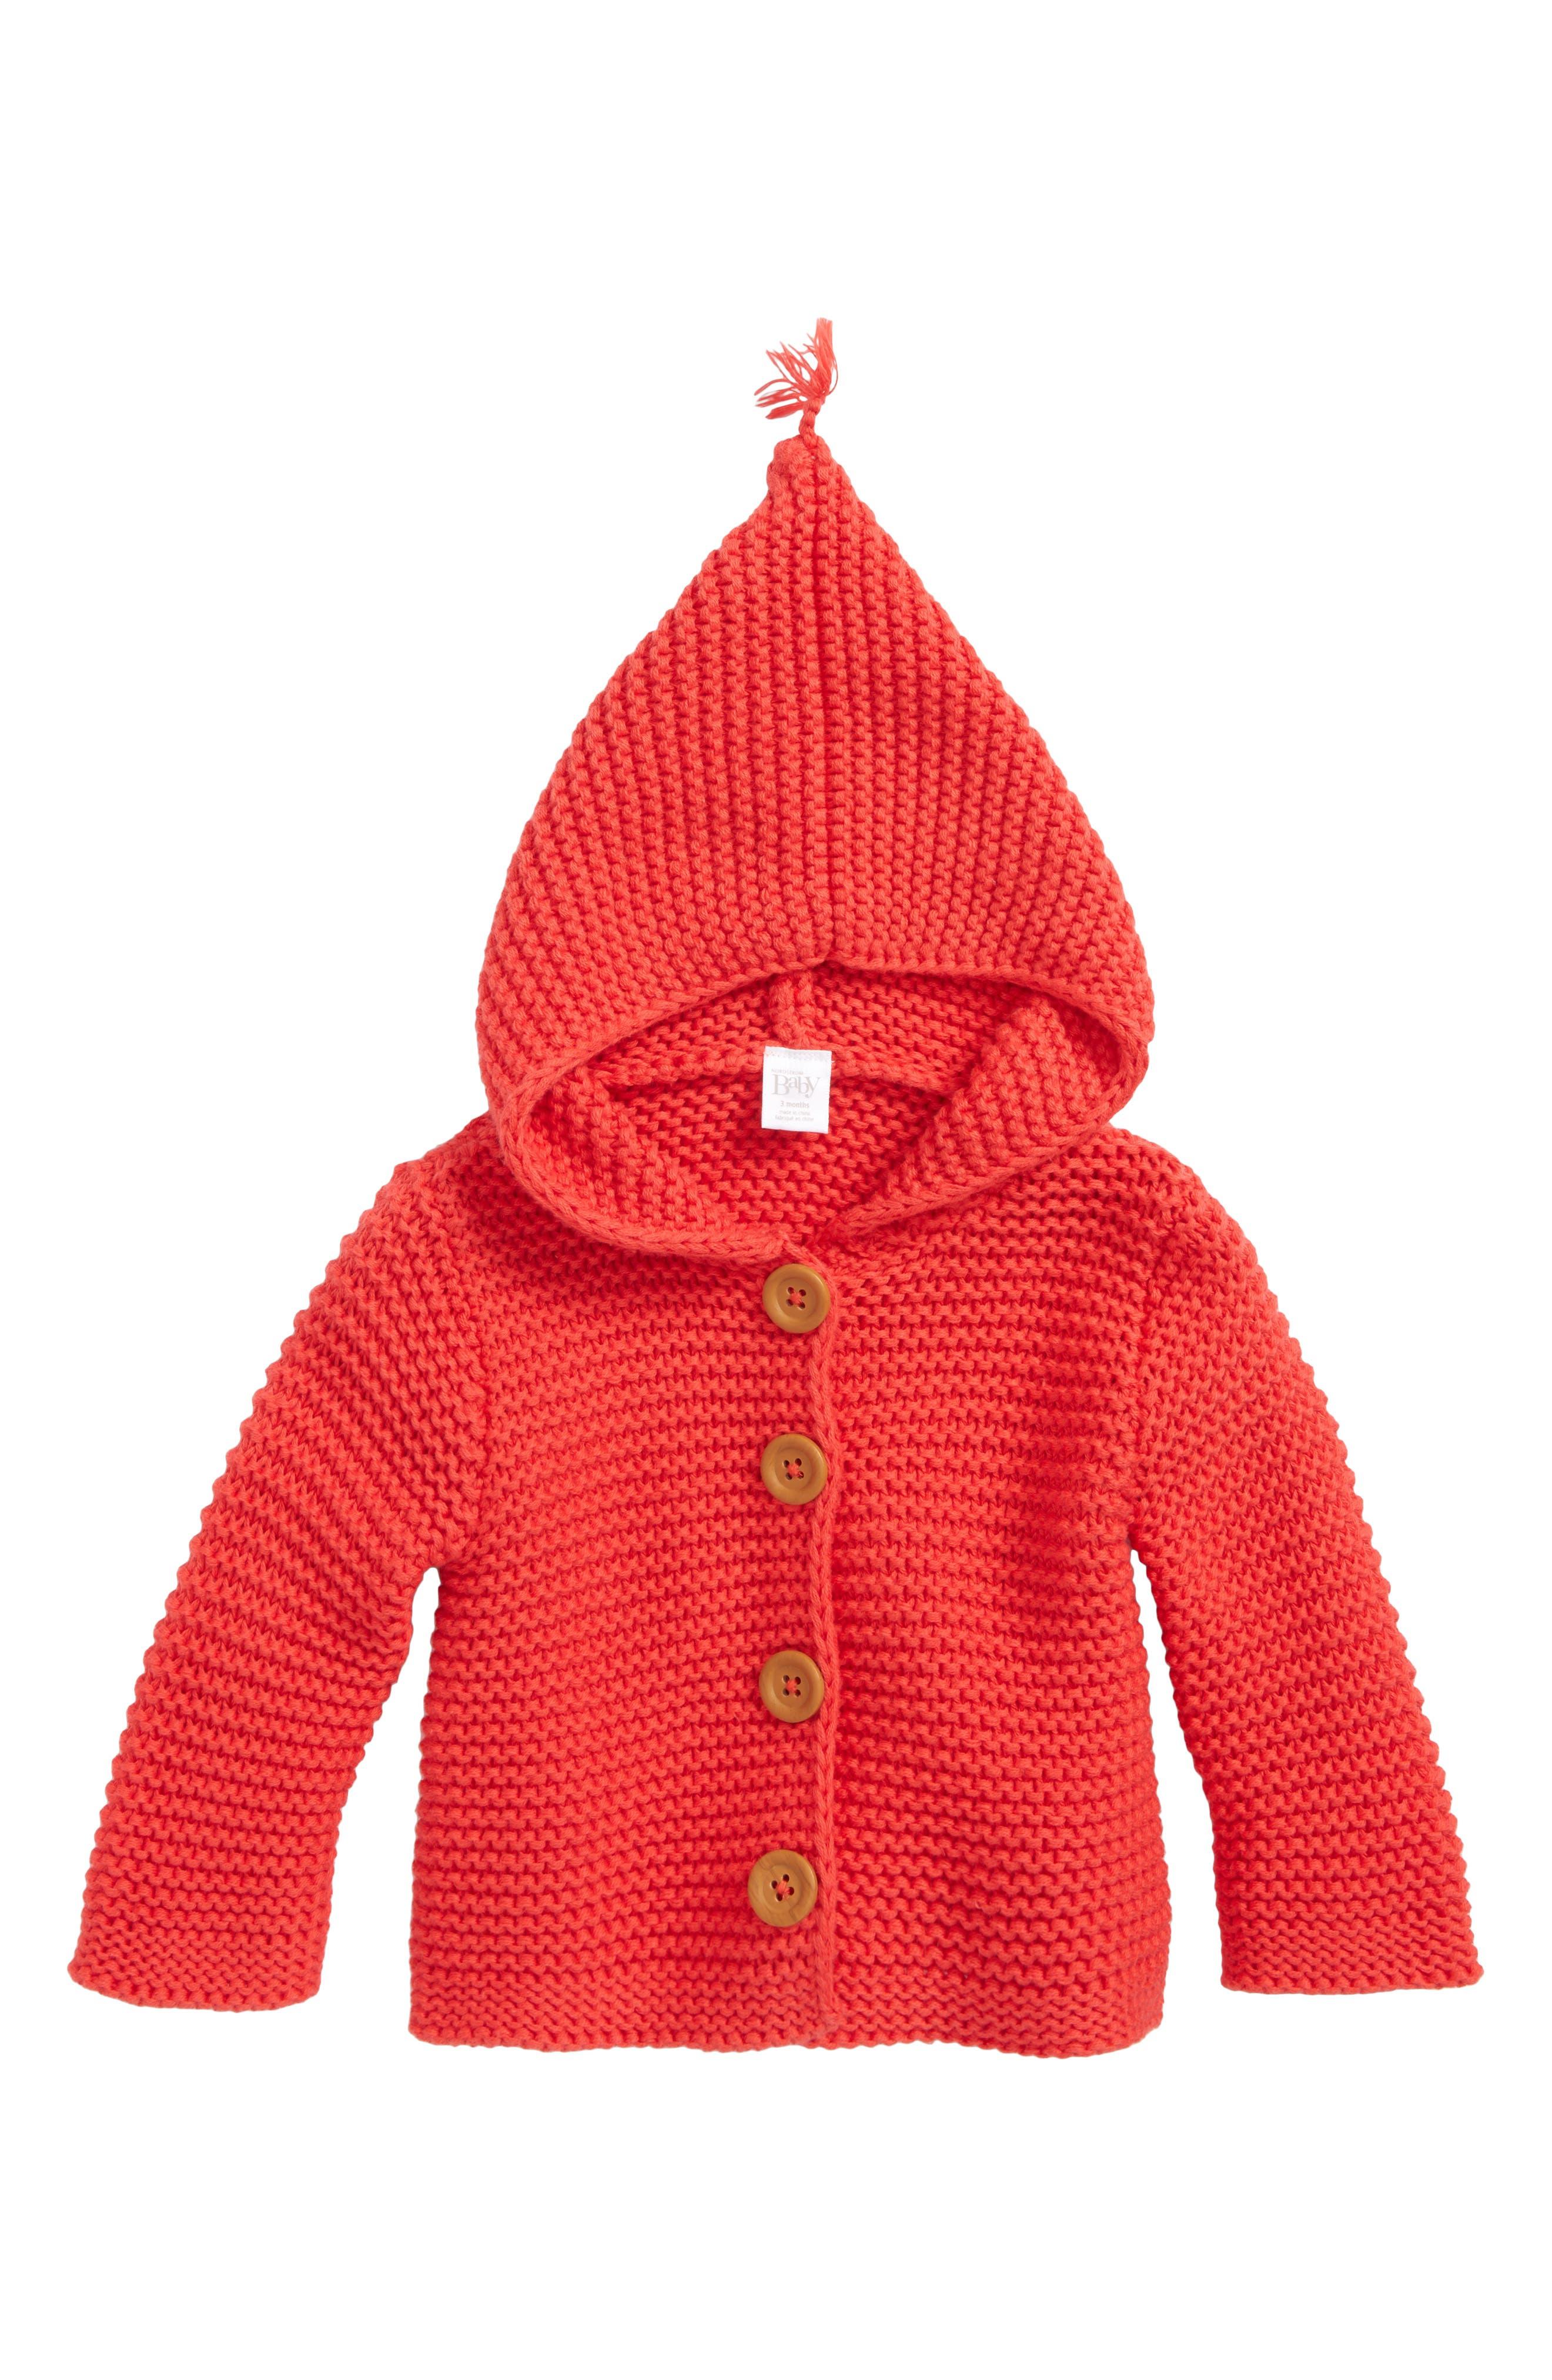 Main Image - Nordstrom Baby Lofty Organic Cotton Hooded Cardigan (Baby)